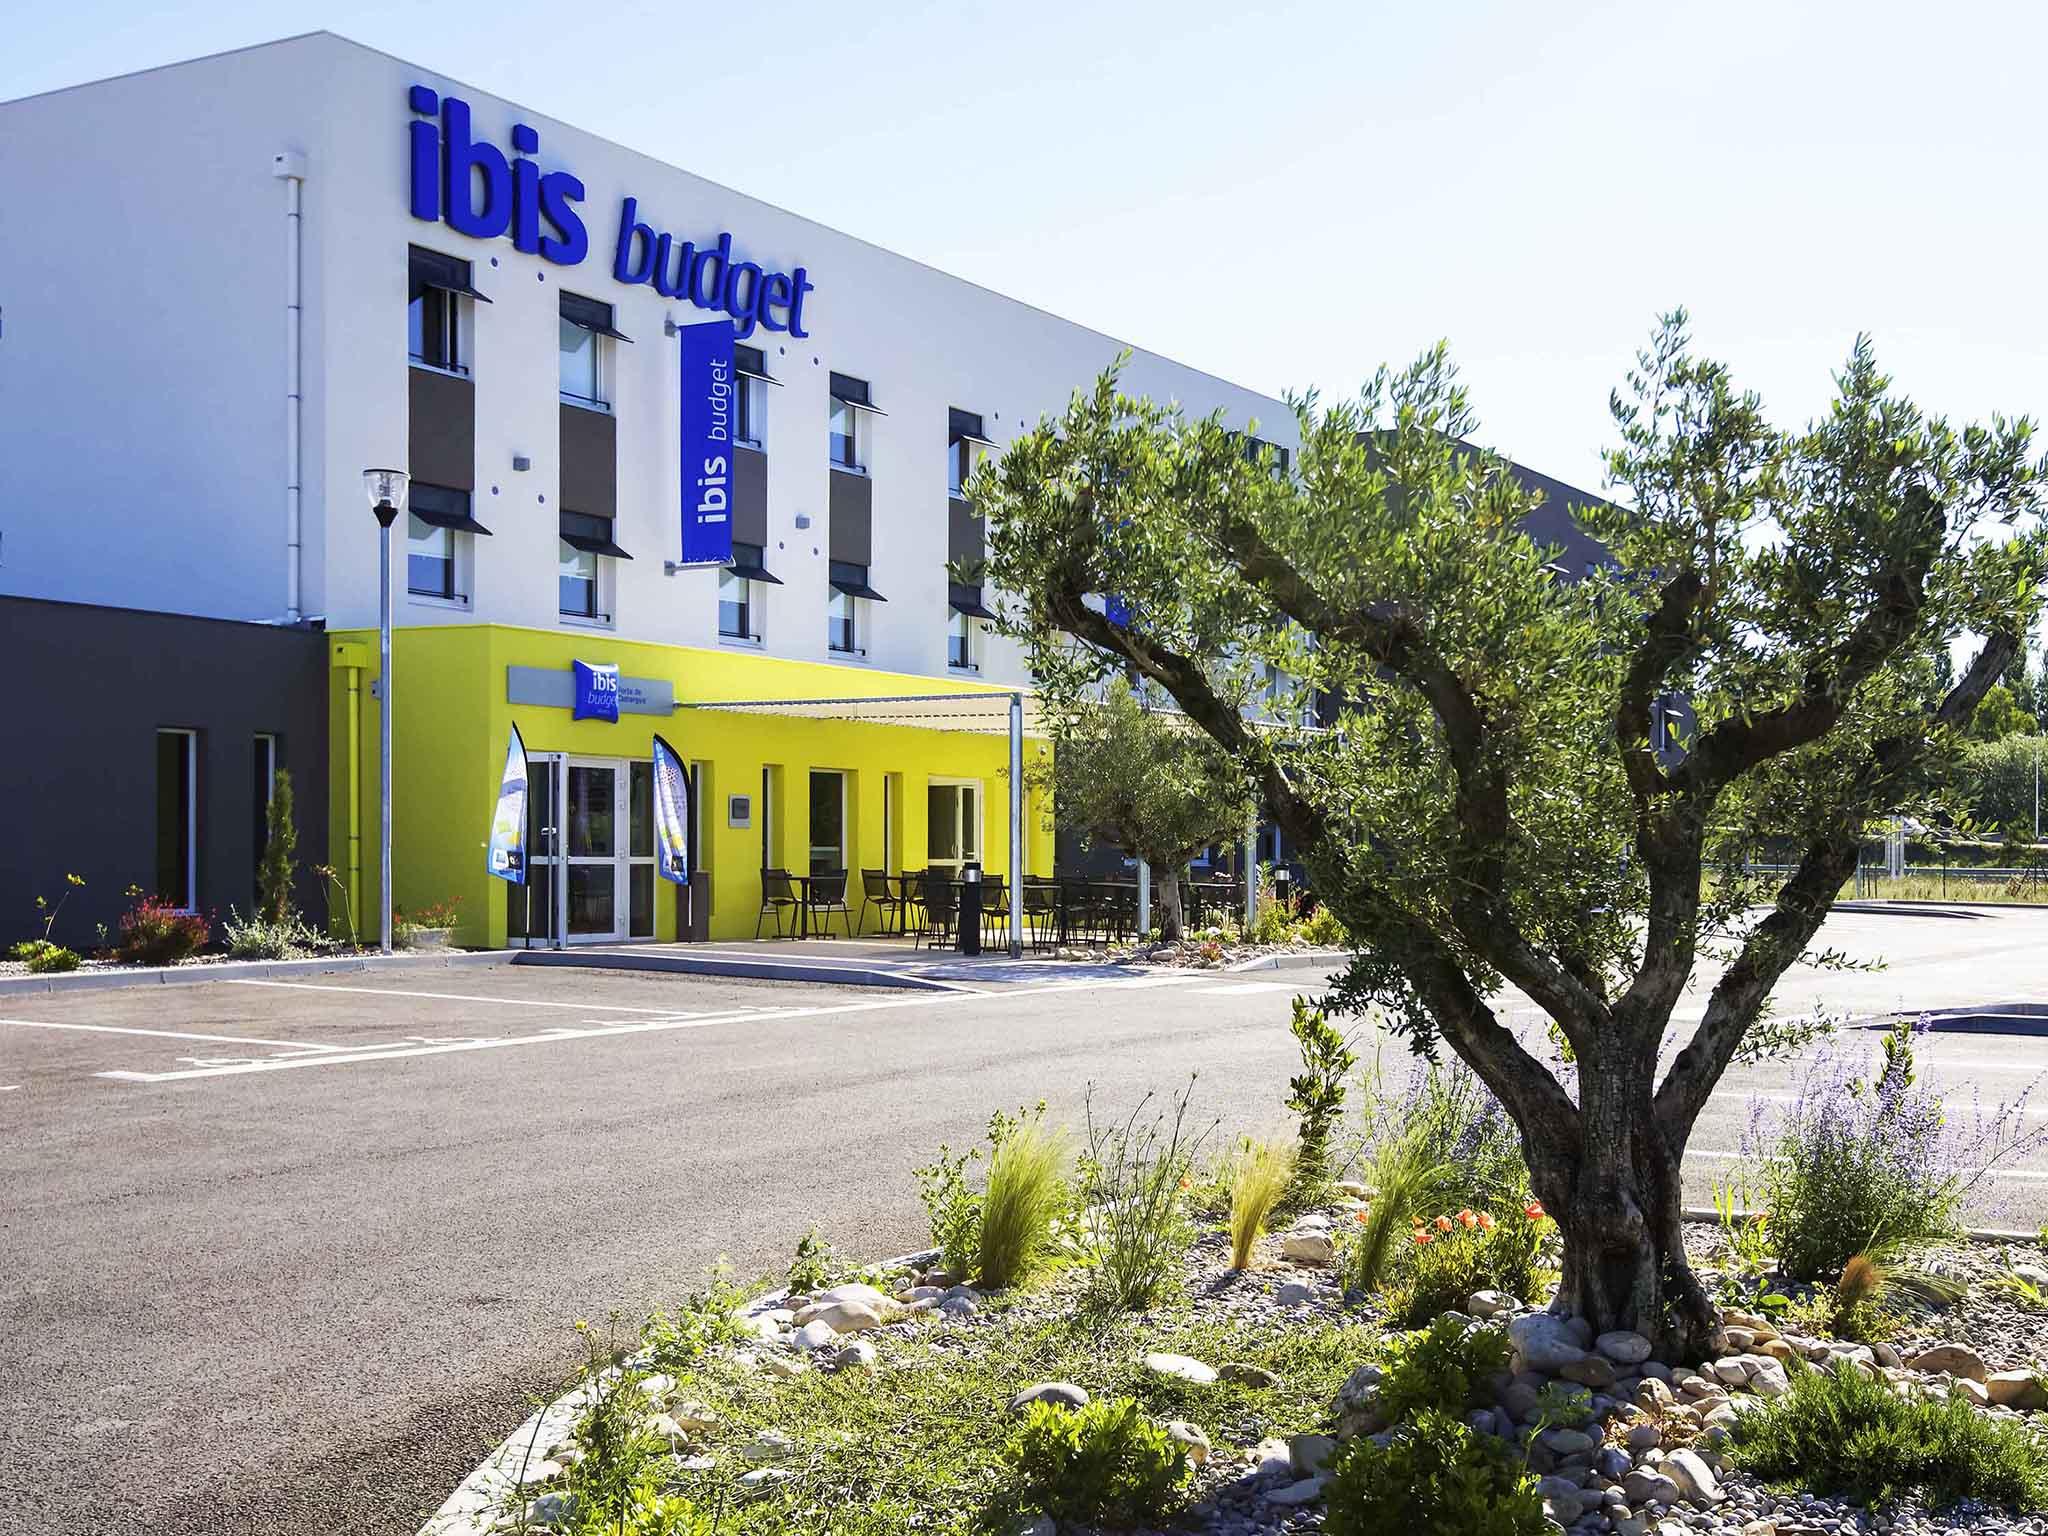 فندق - ibis budget Saint-Martin-de-Crau Porte de Camargue